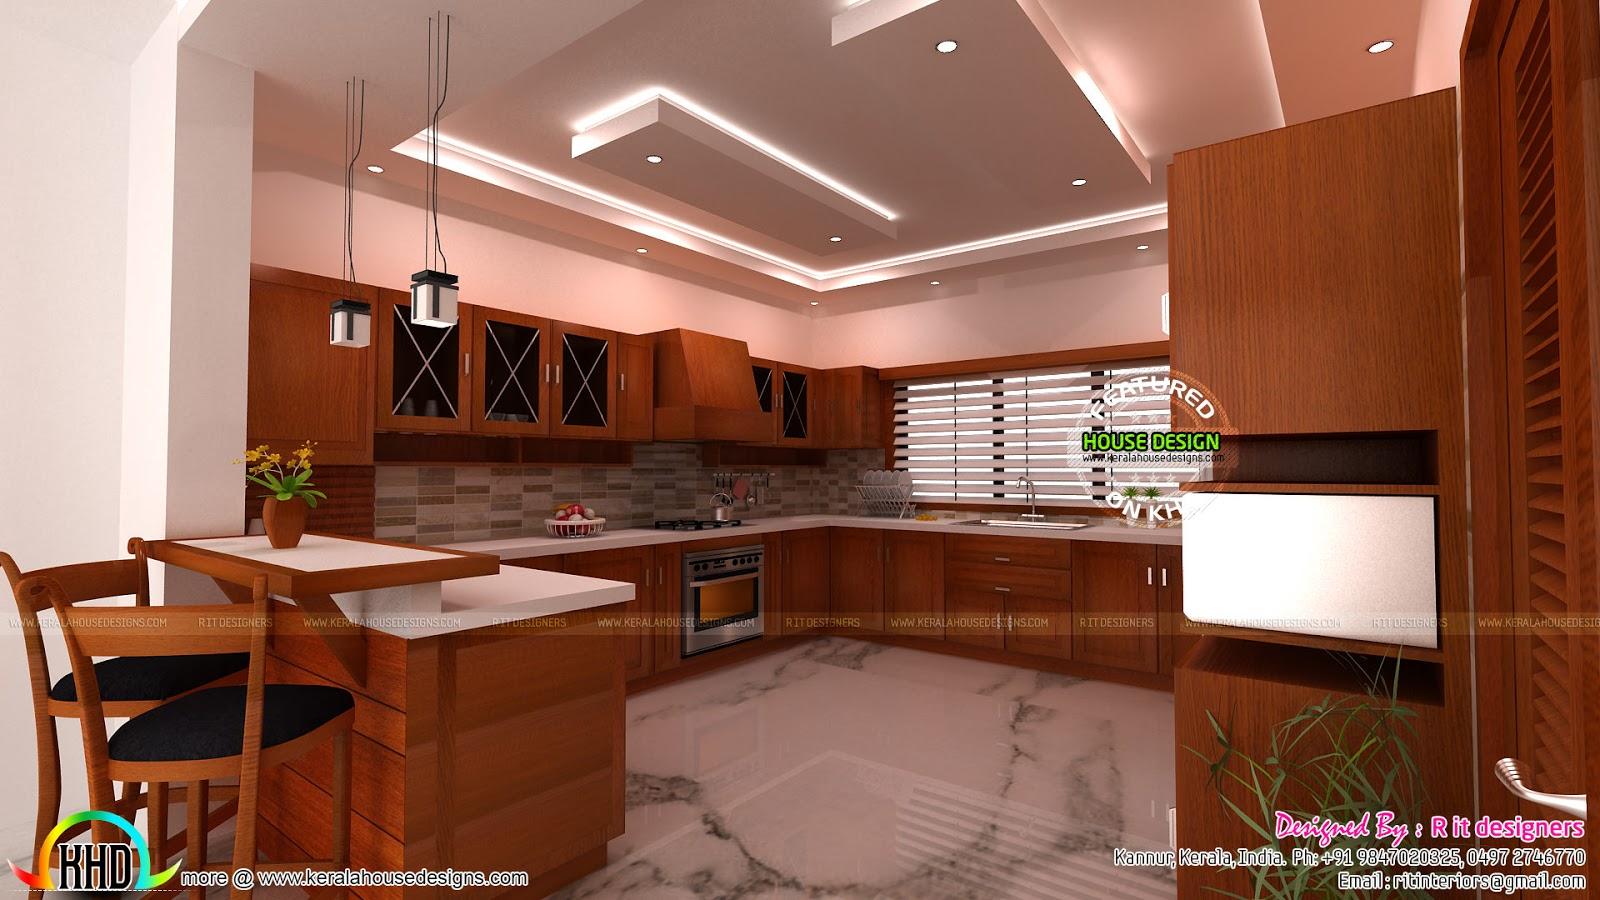 modular kitchen interiors shaped modular kitchen design images kitchen interiors modular kitchens chennai chennai interior